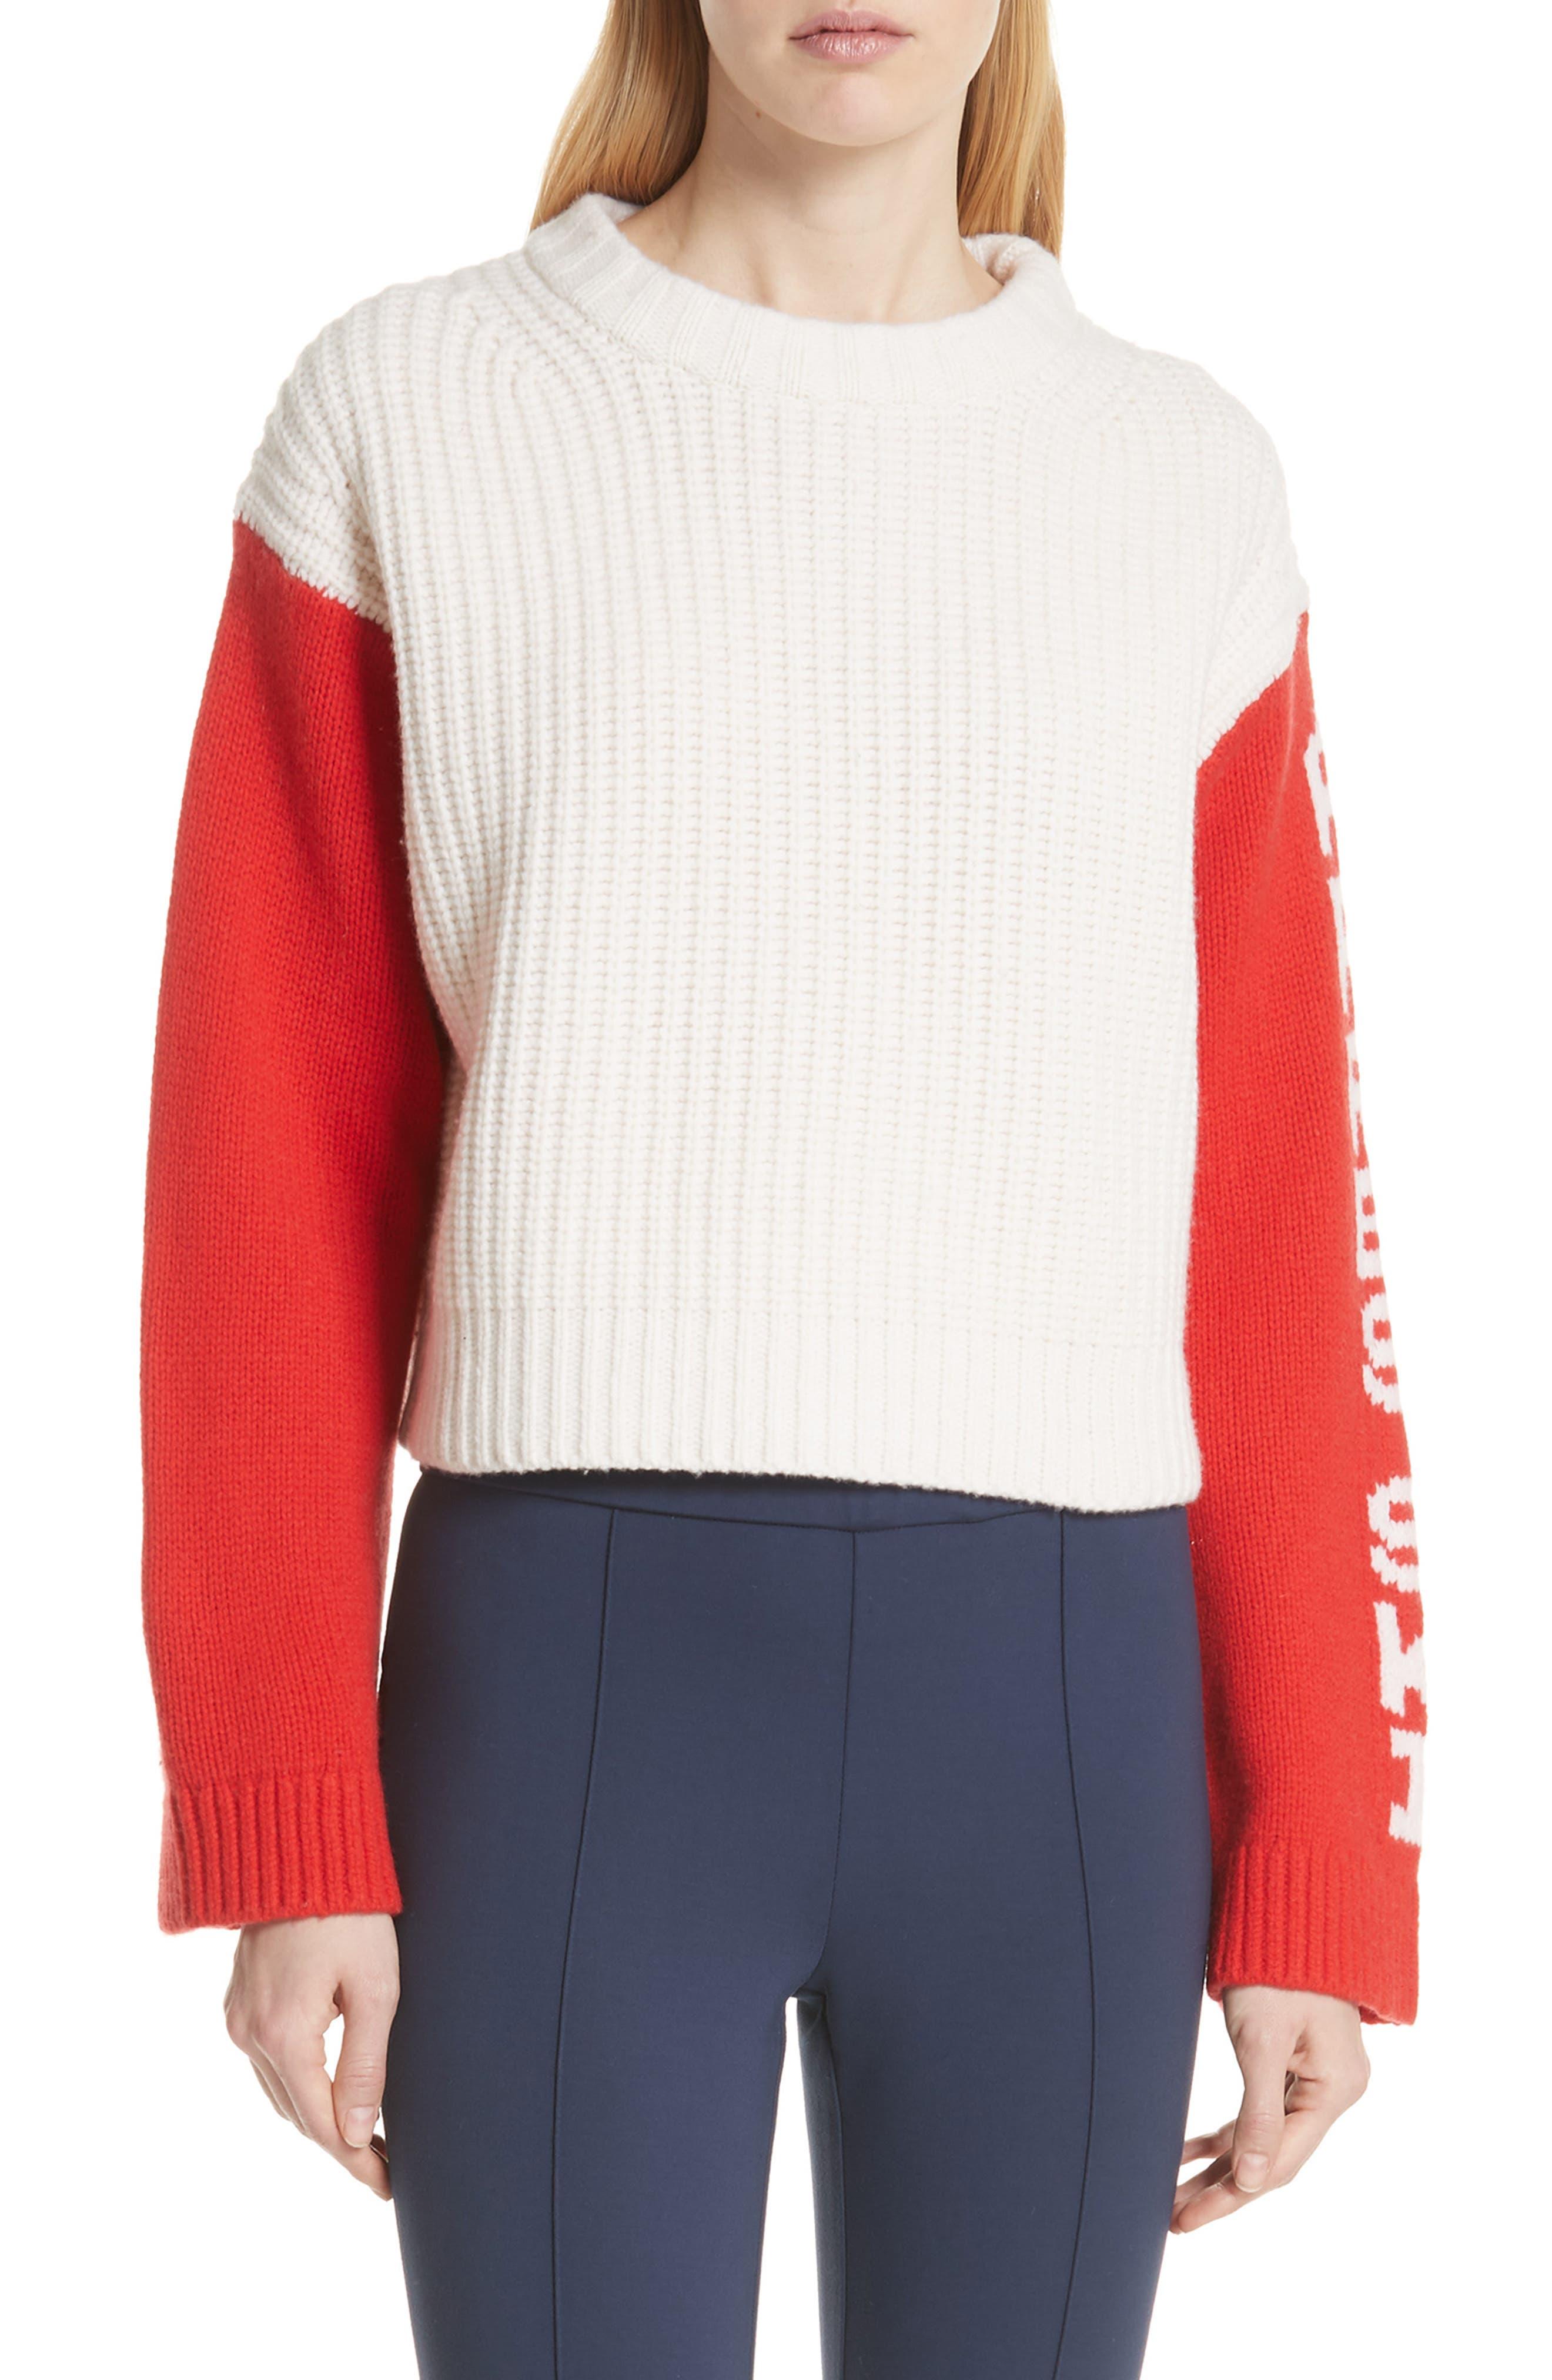 Tory Sport Crop Apres Ski Sweater, White